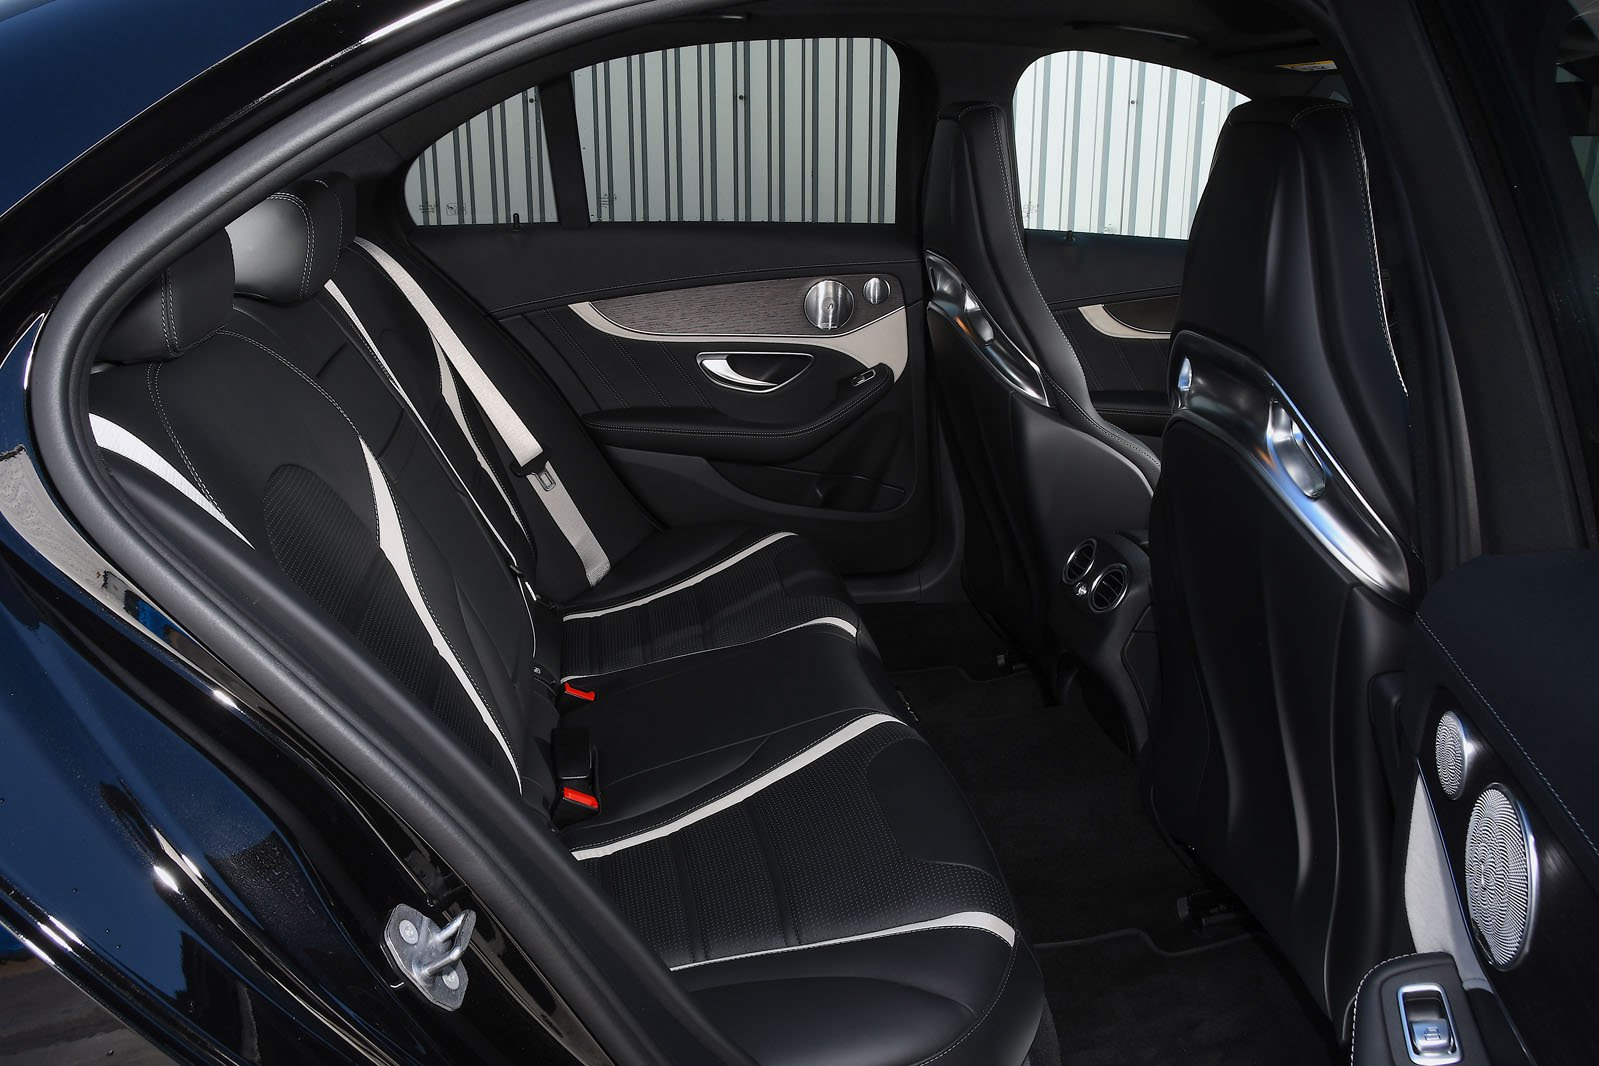 Mercedes C63 S 2020 rear seats